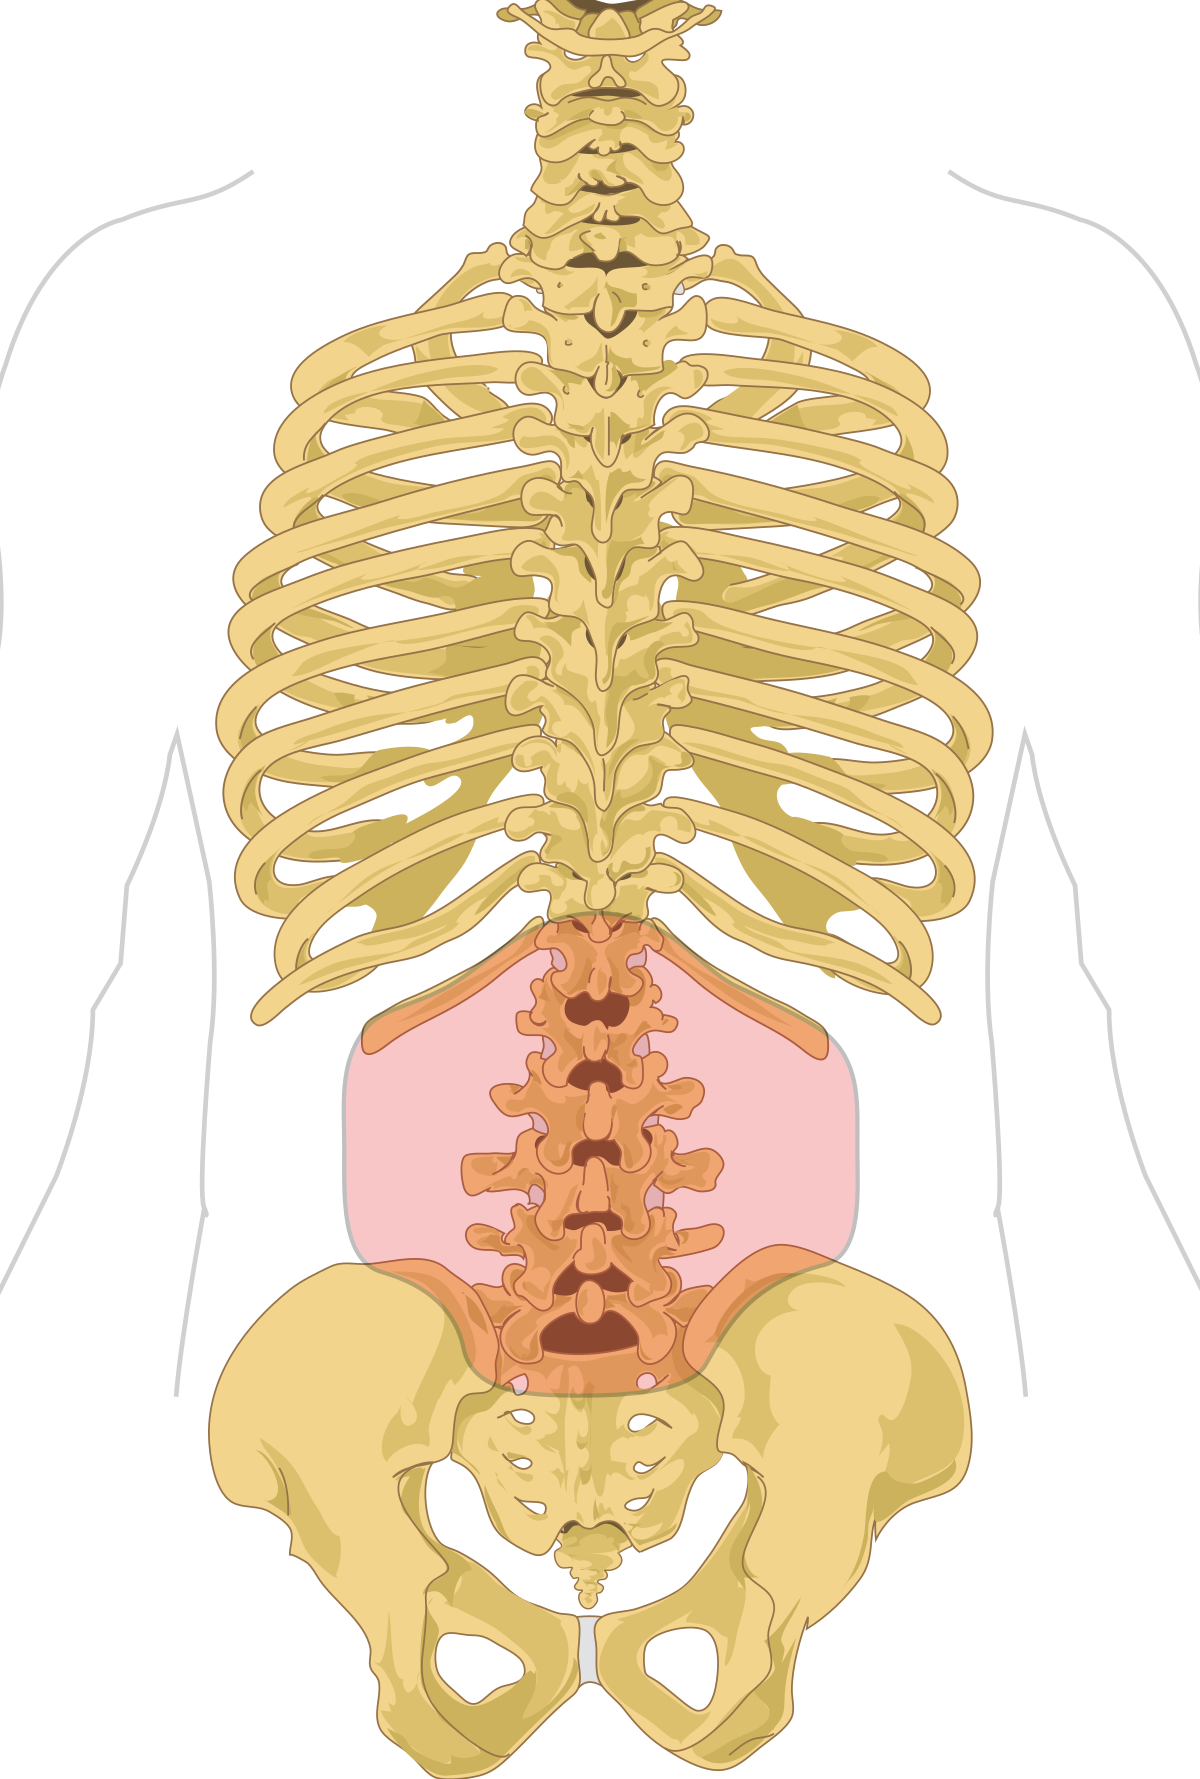 care vertebre cervicale sunt responsabile de vedere